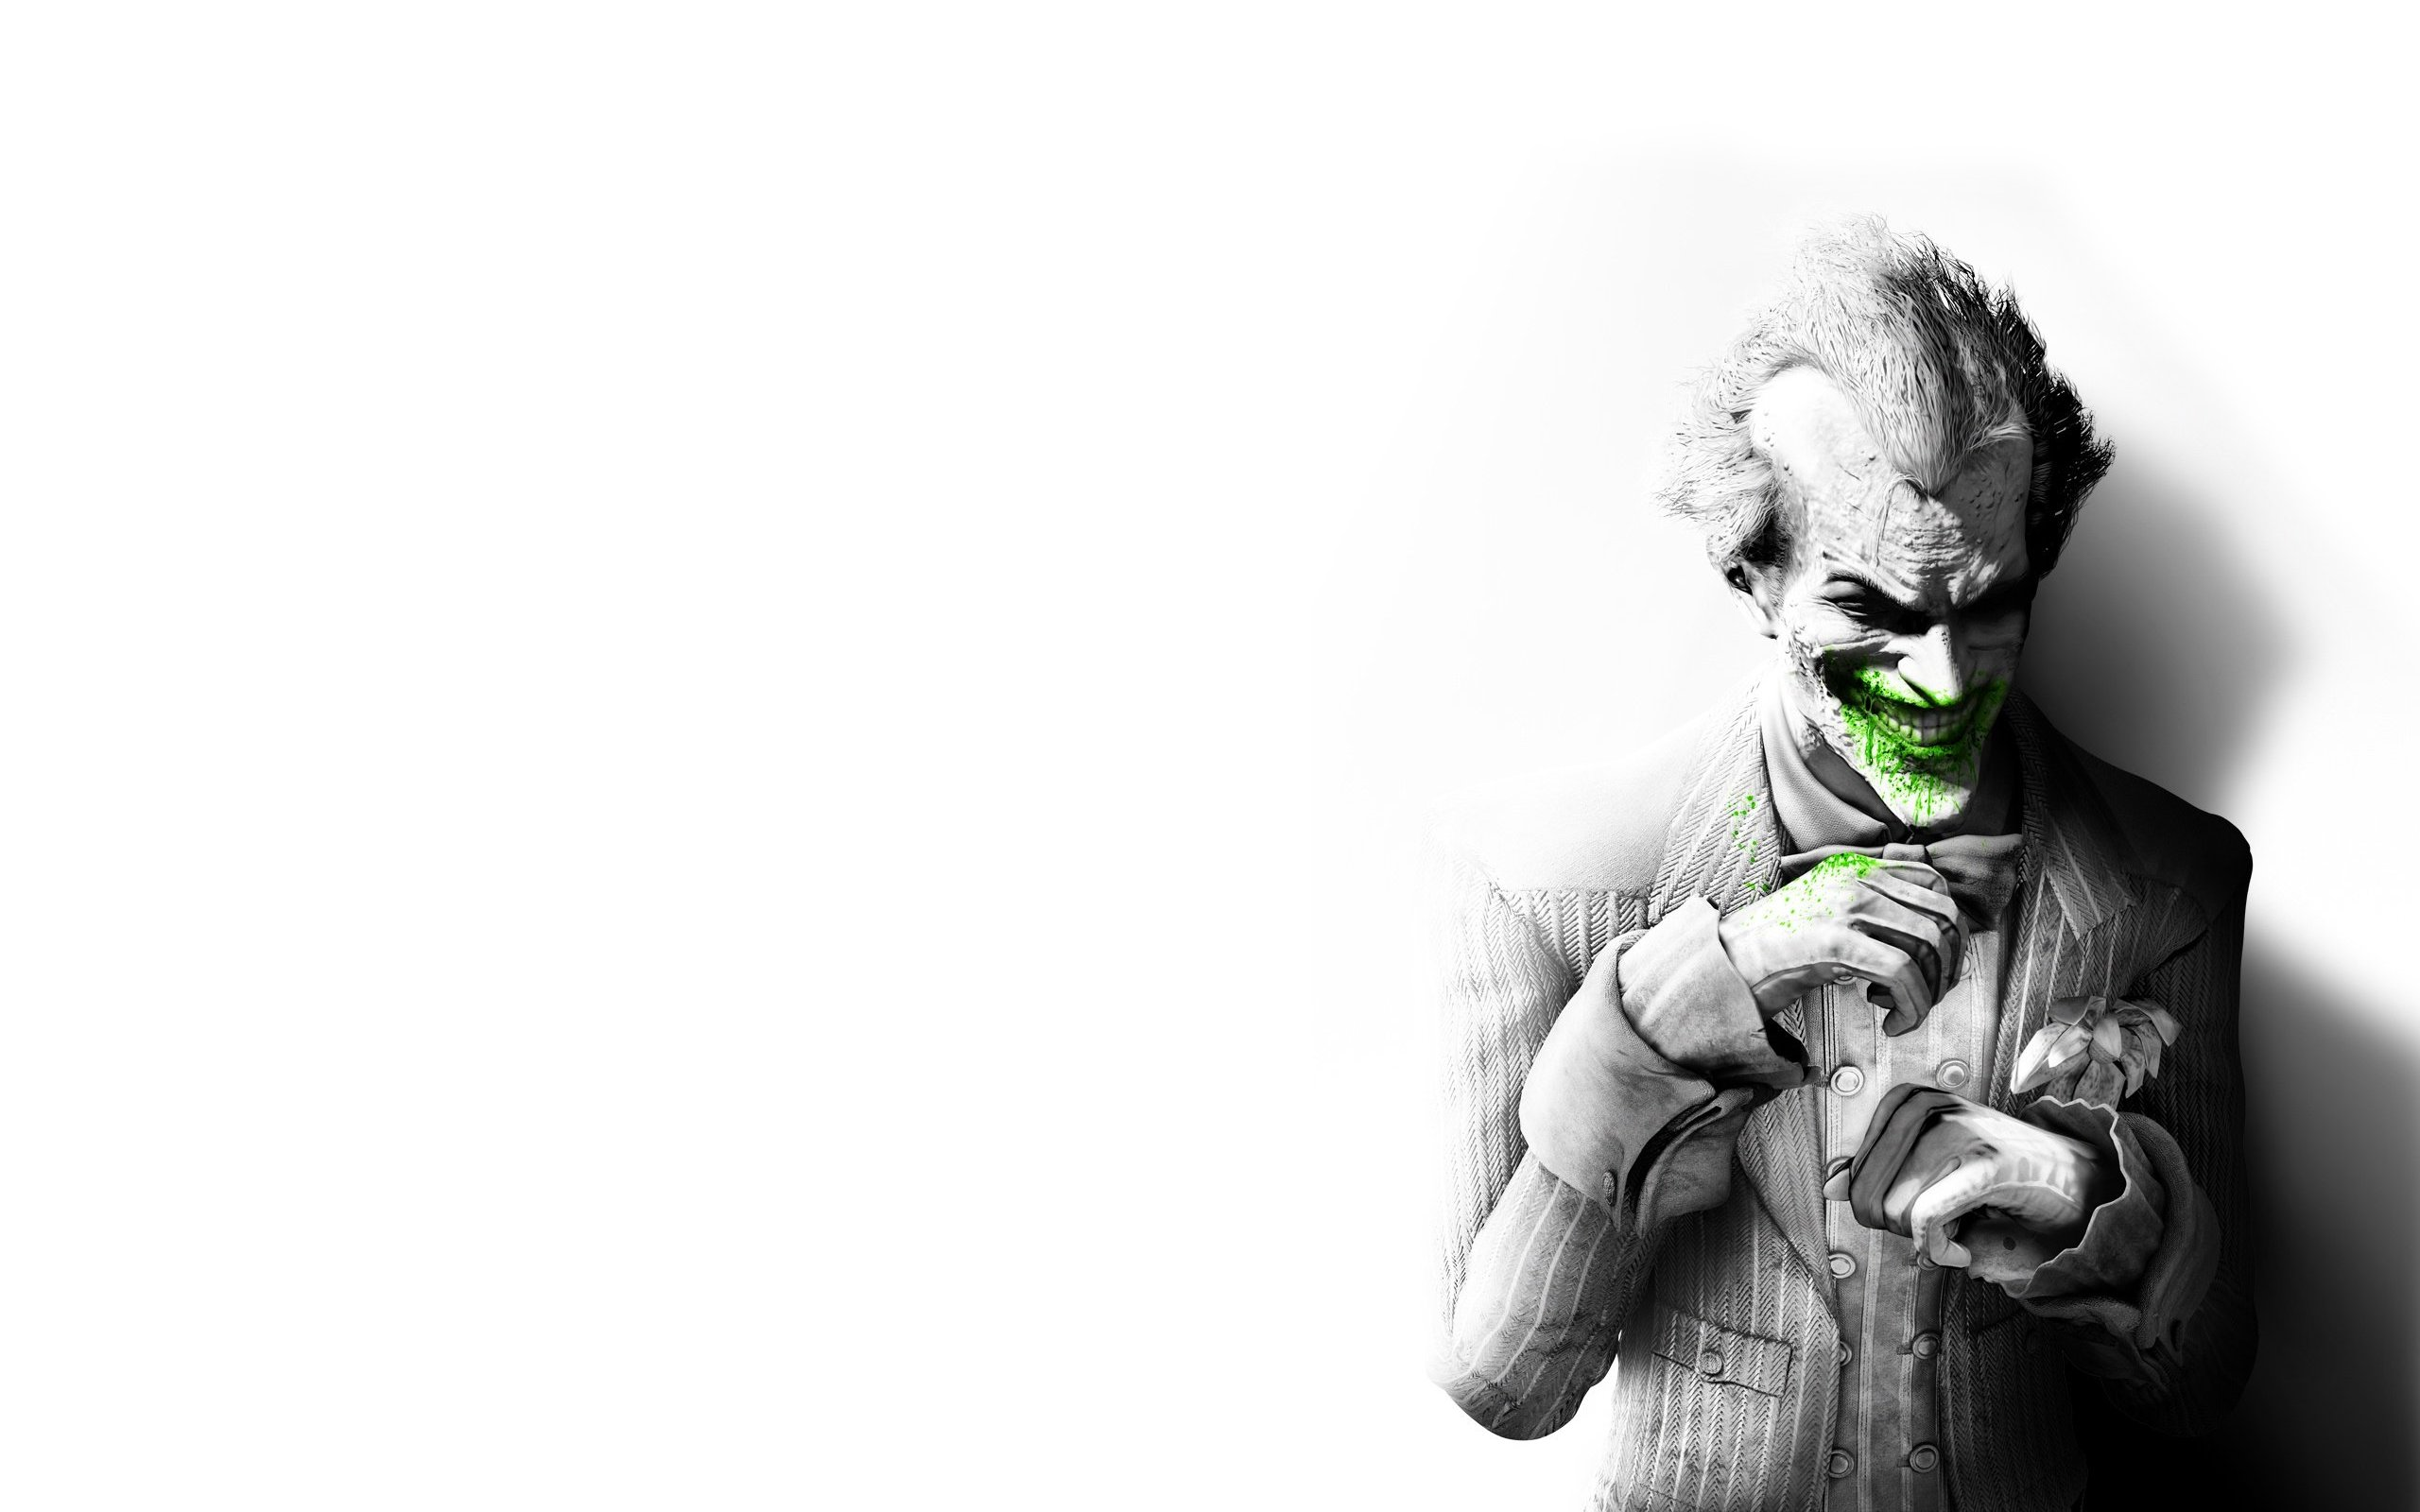 190 batman: arkham city hd wallpapers | background images